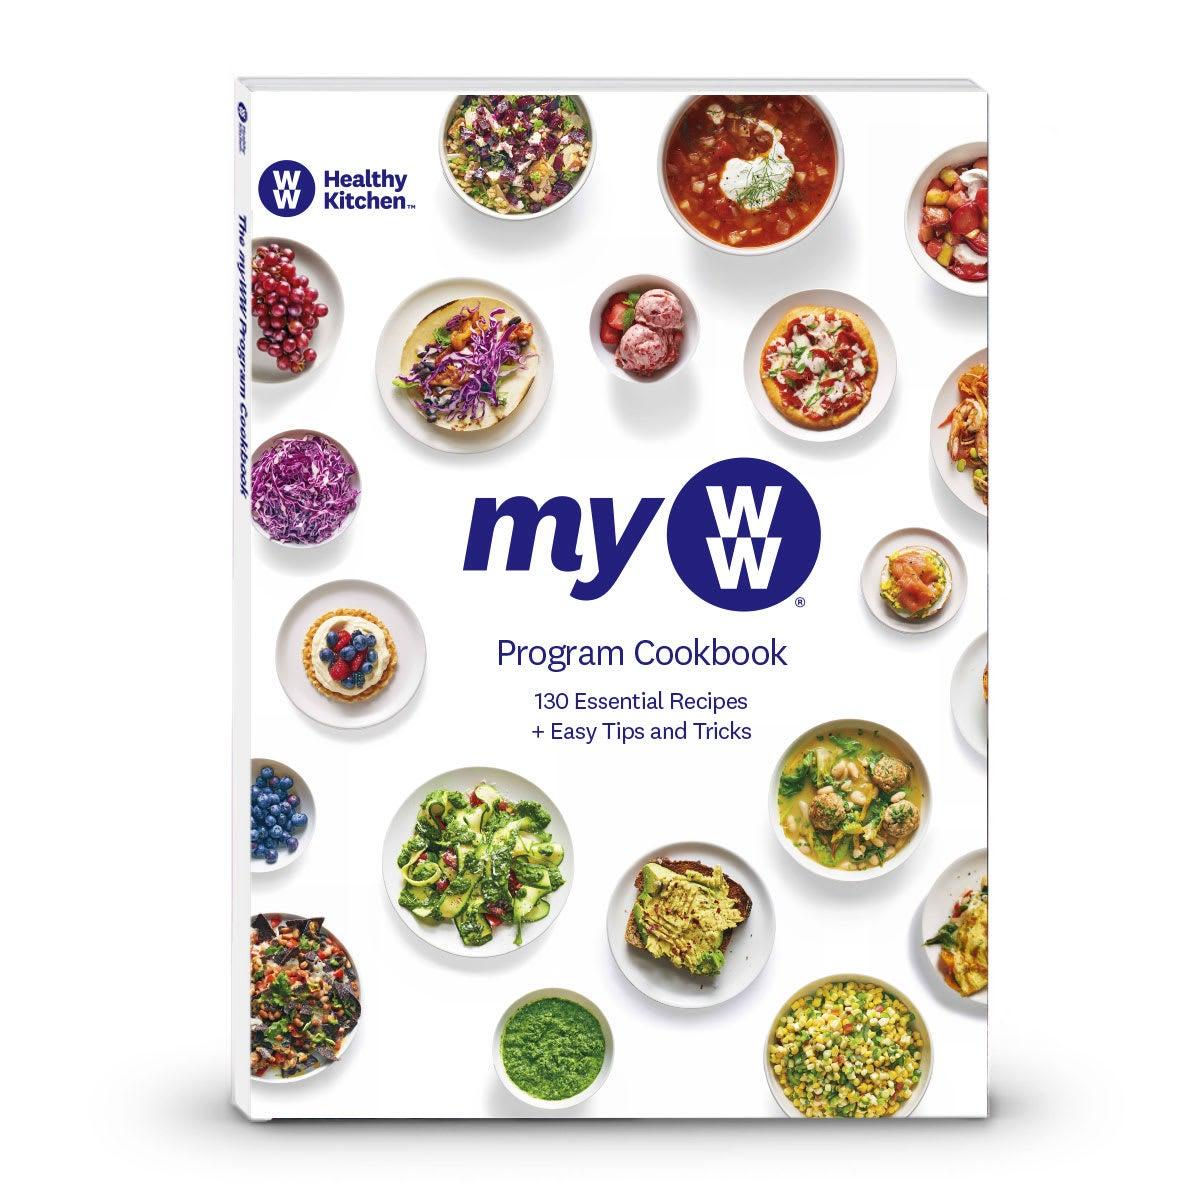 myWW Program Cookbook cover